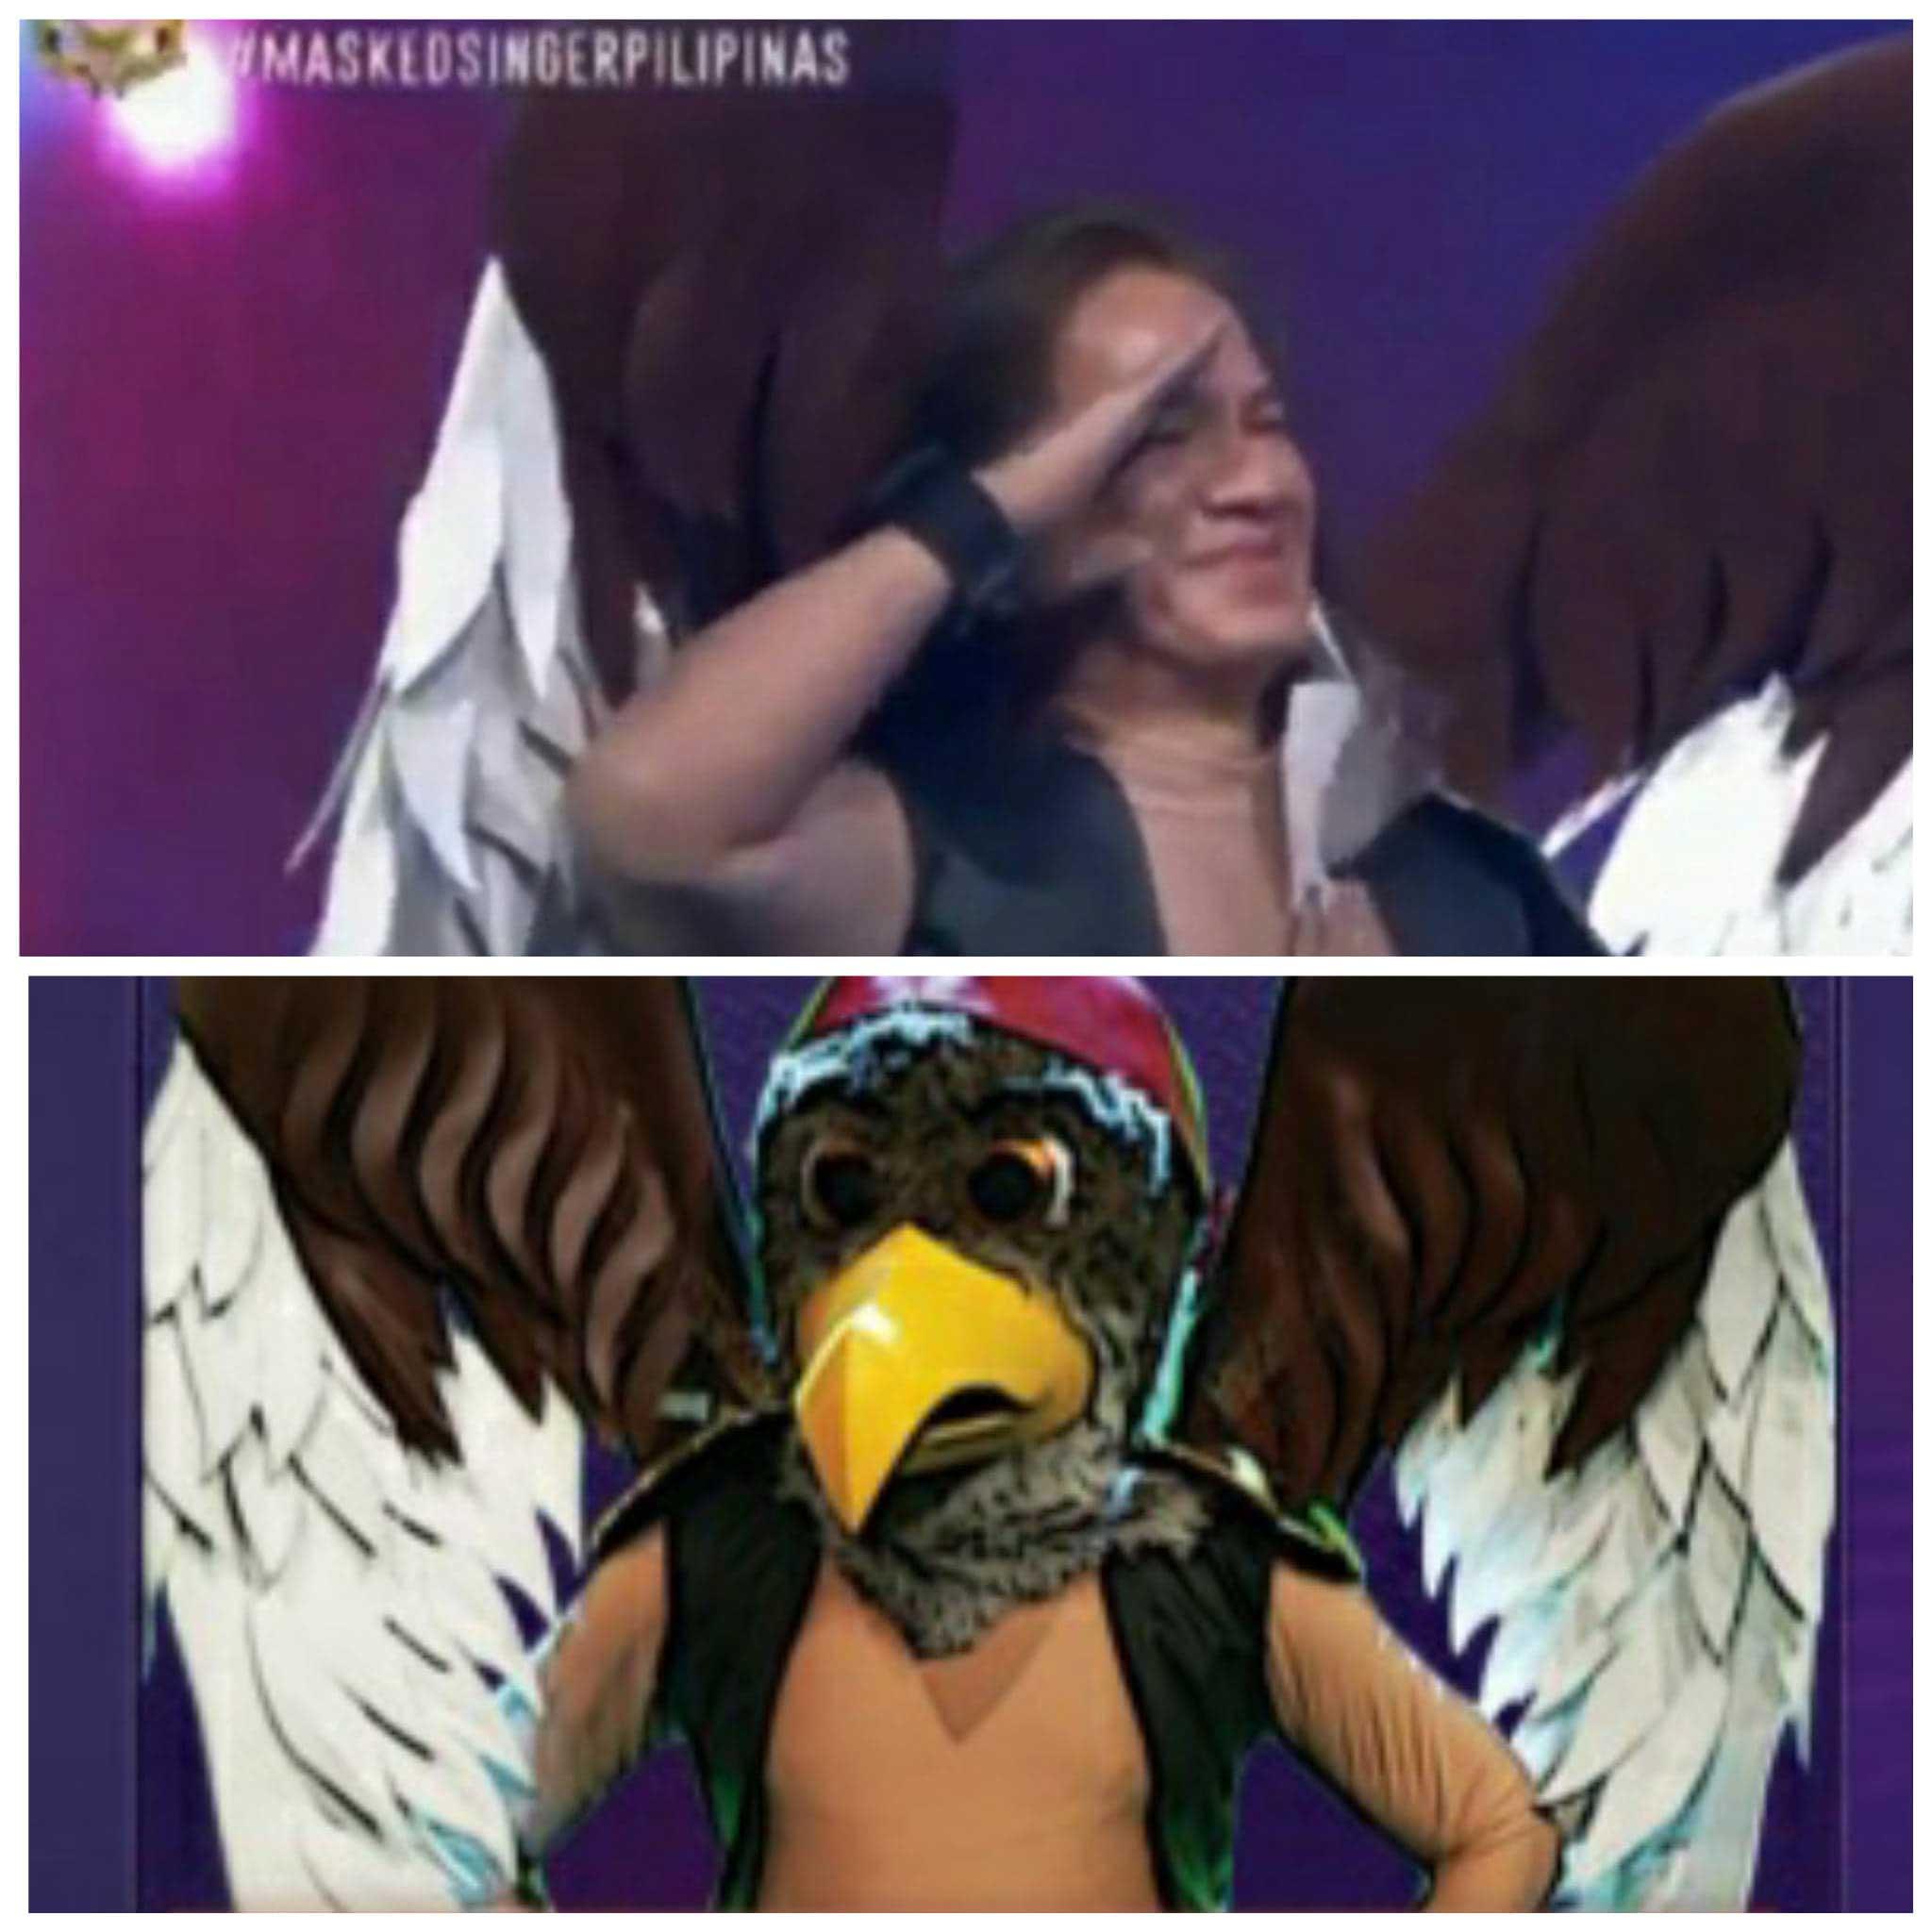 Joey Generoso as Masked Singer Agila in Masked Singer Pilipinas.